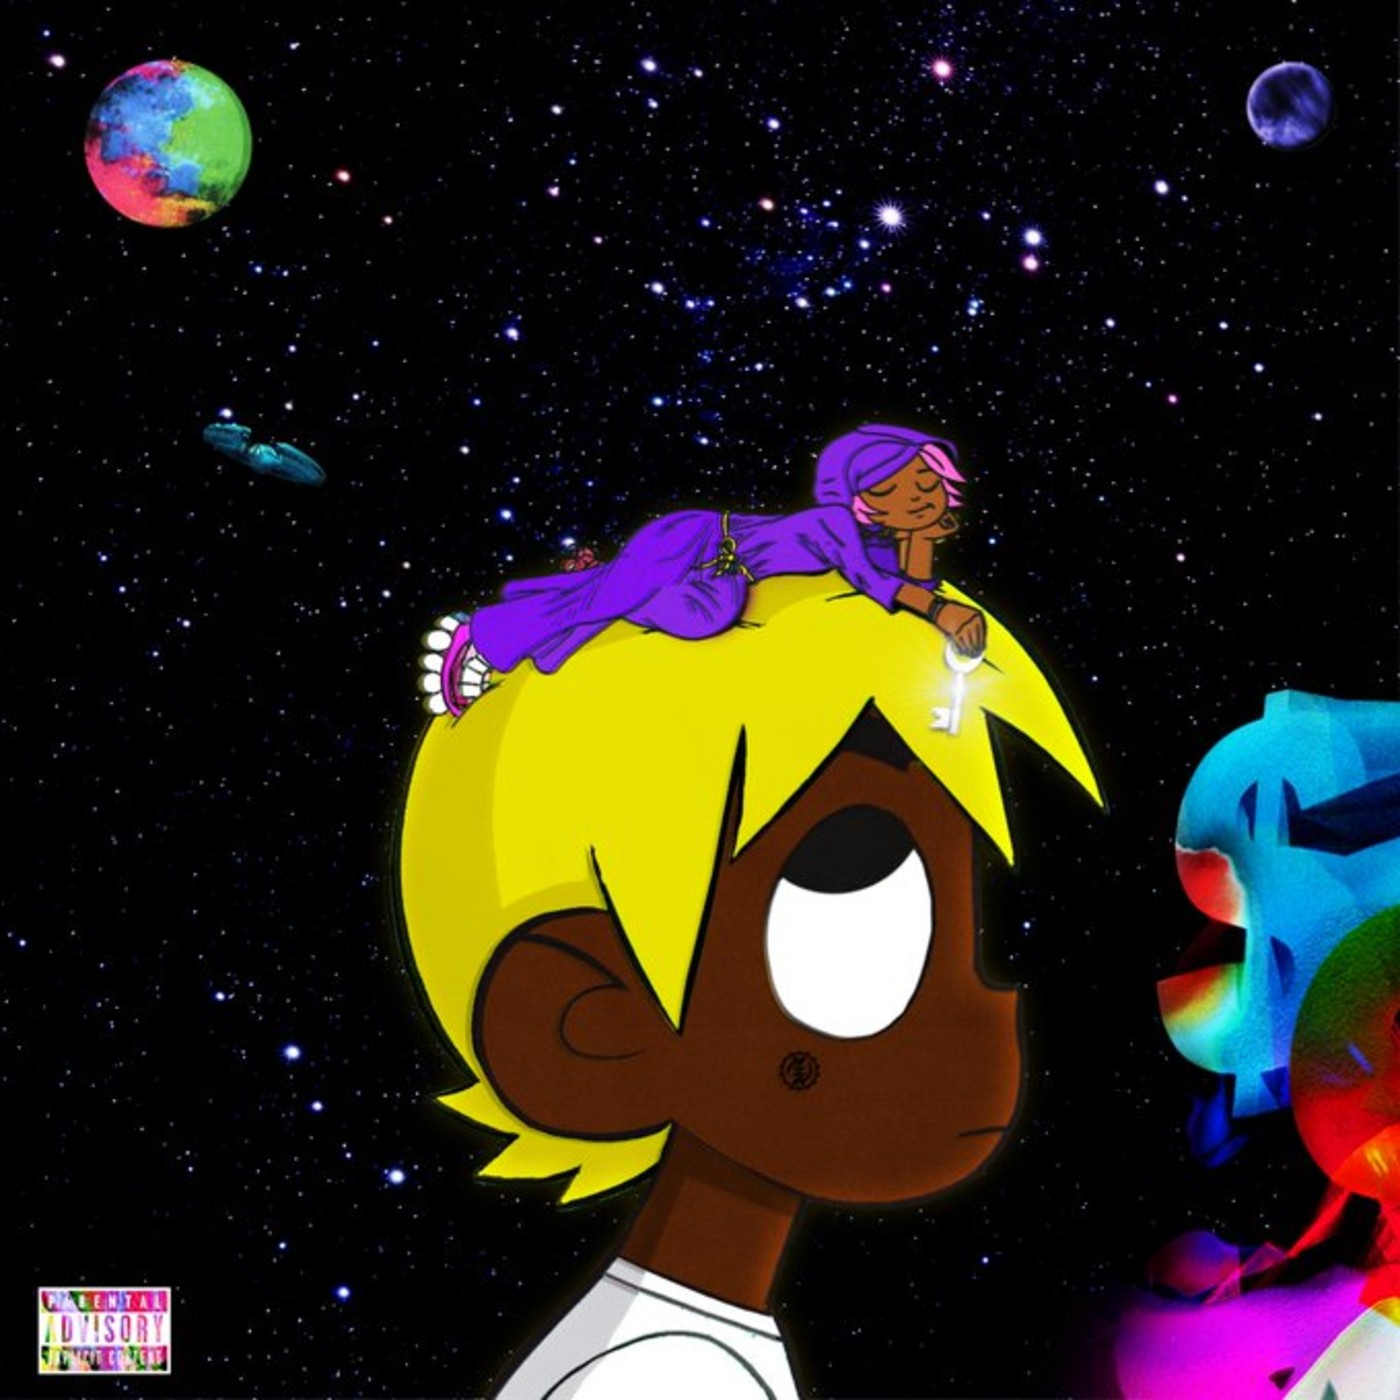 Lil Uzi Vert 'Eternal Atake' Deluxe